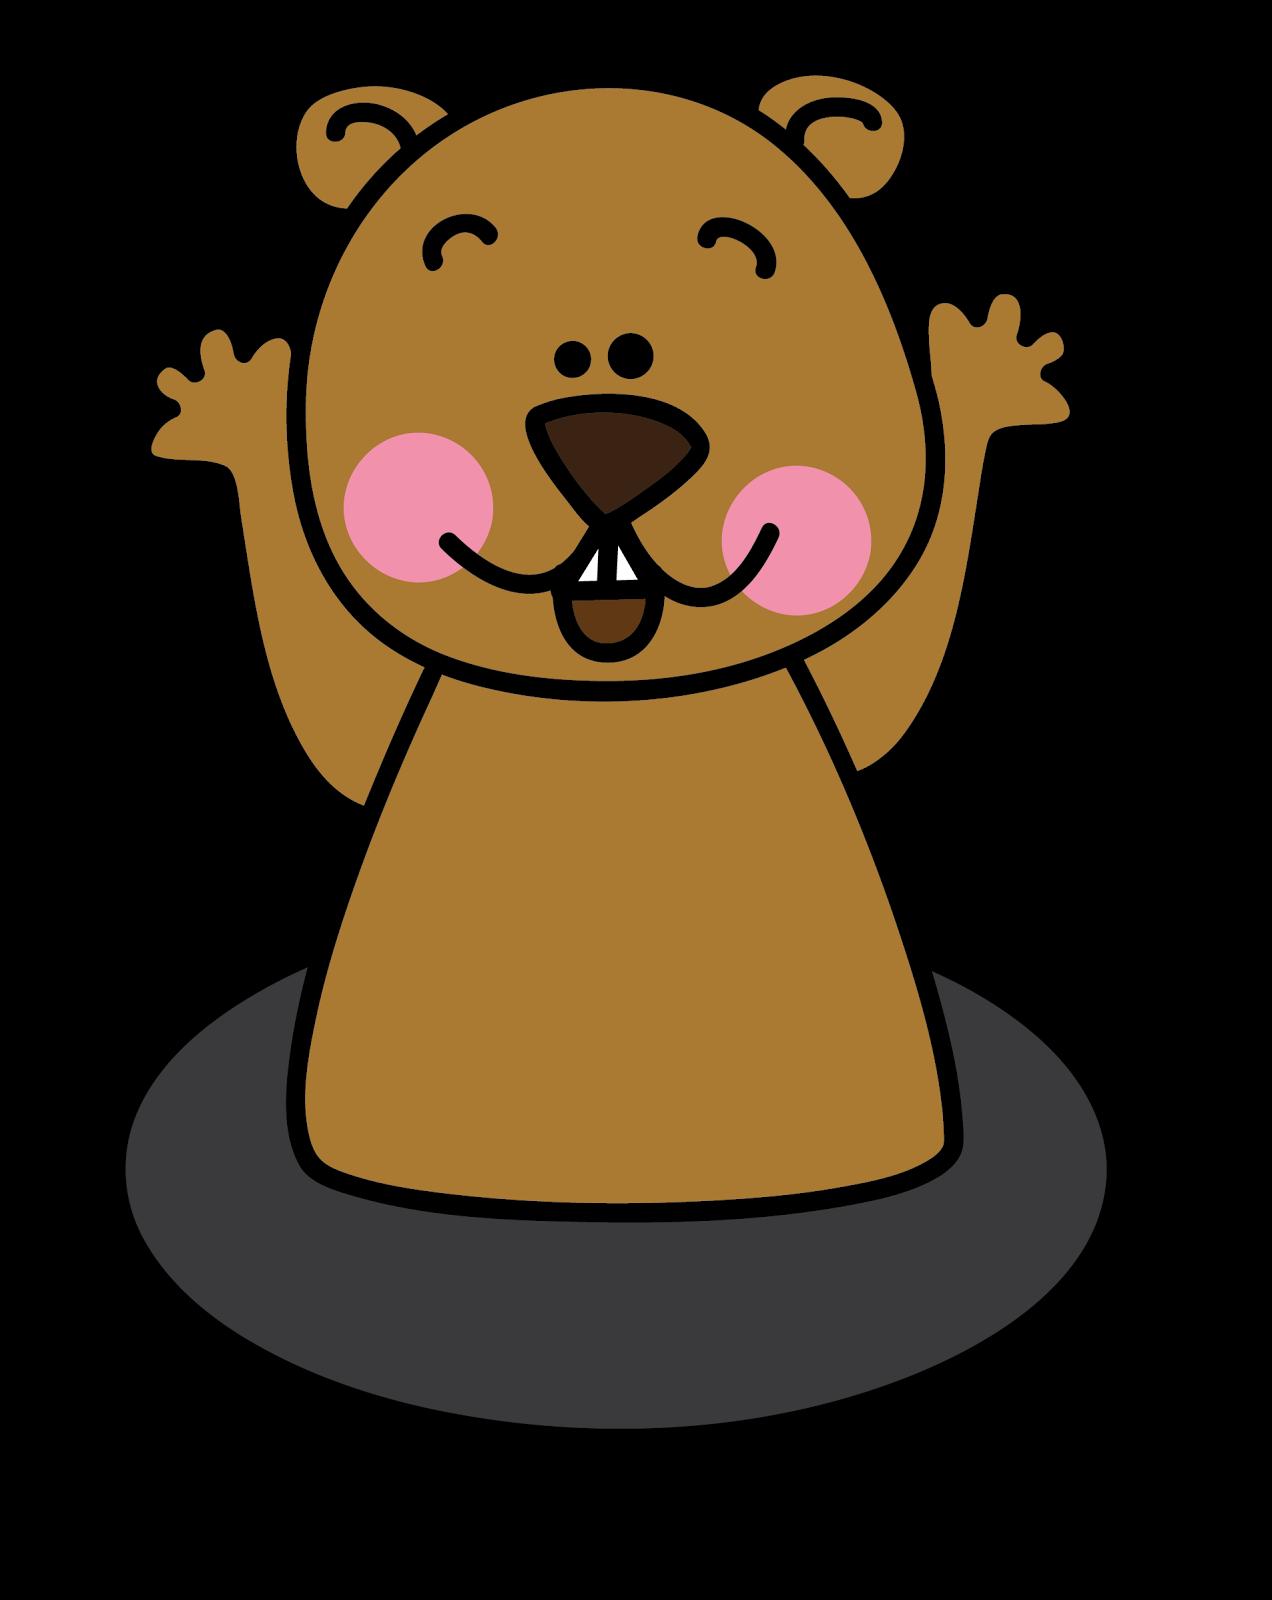 Free Groundhog Clipart-Free Groundhog Clipart-10